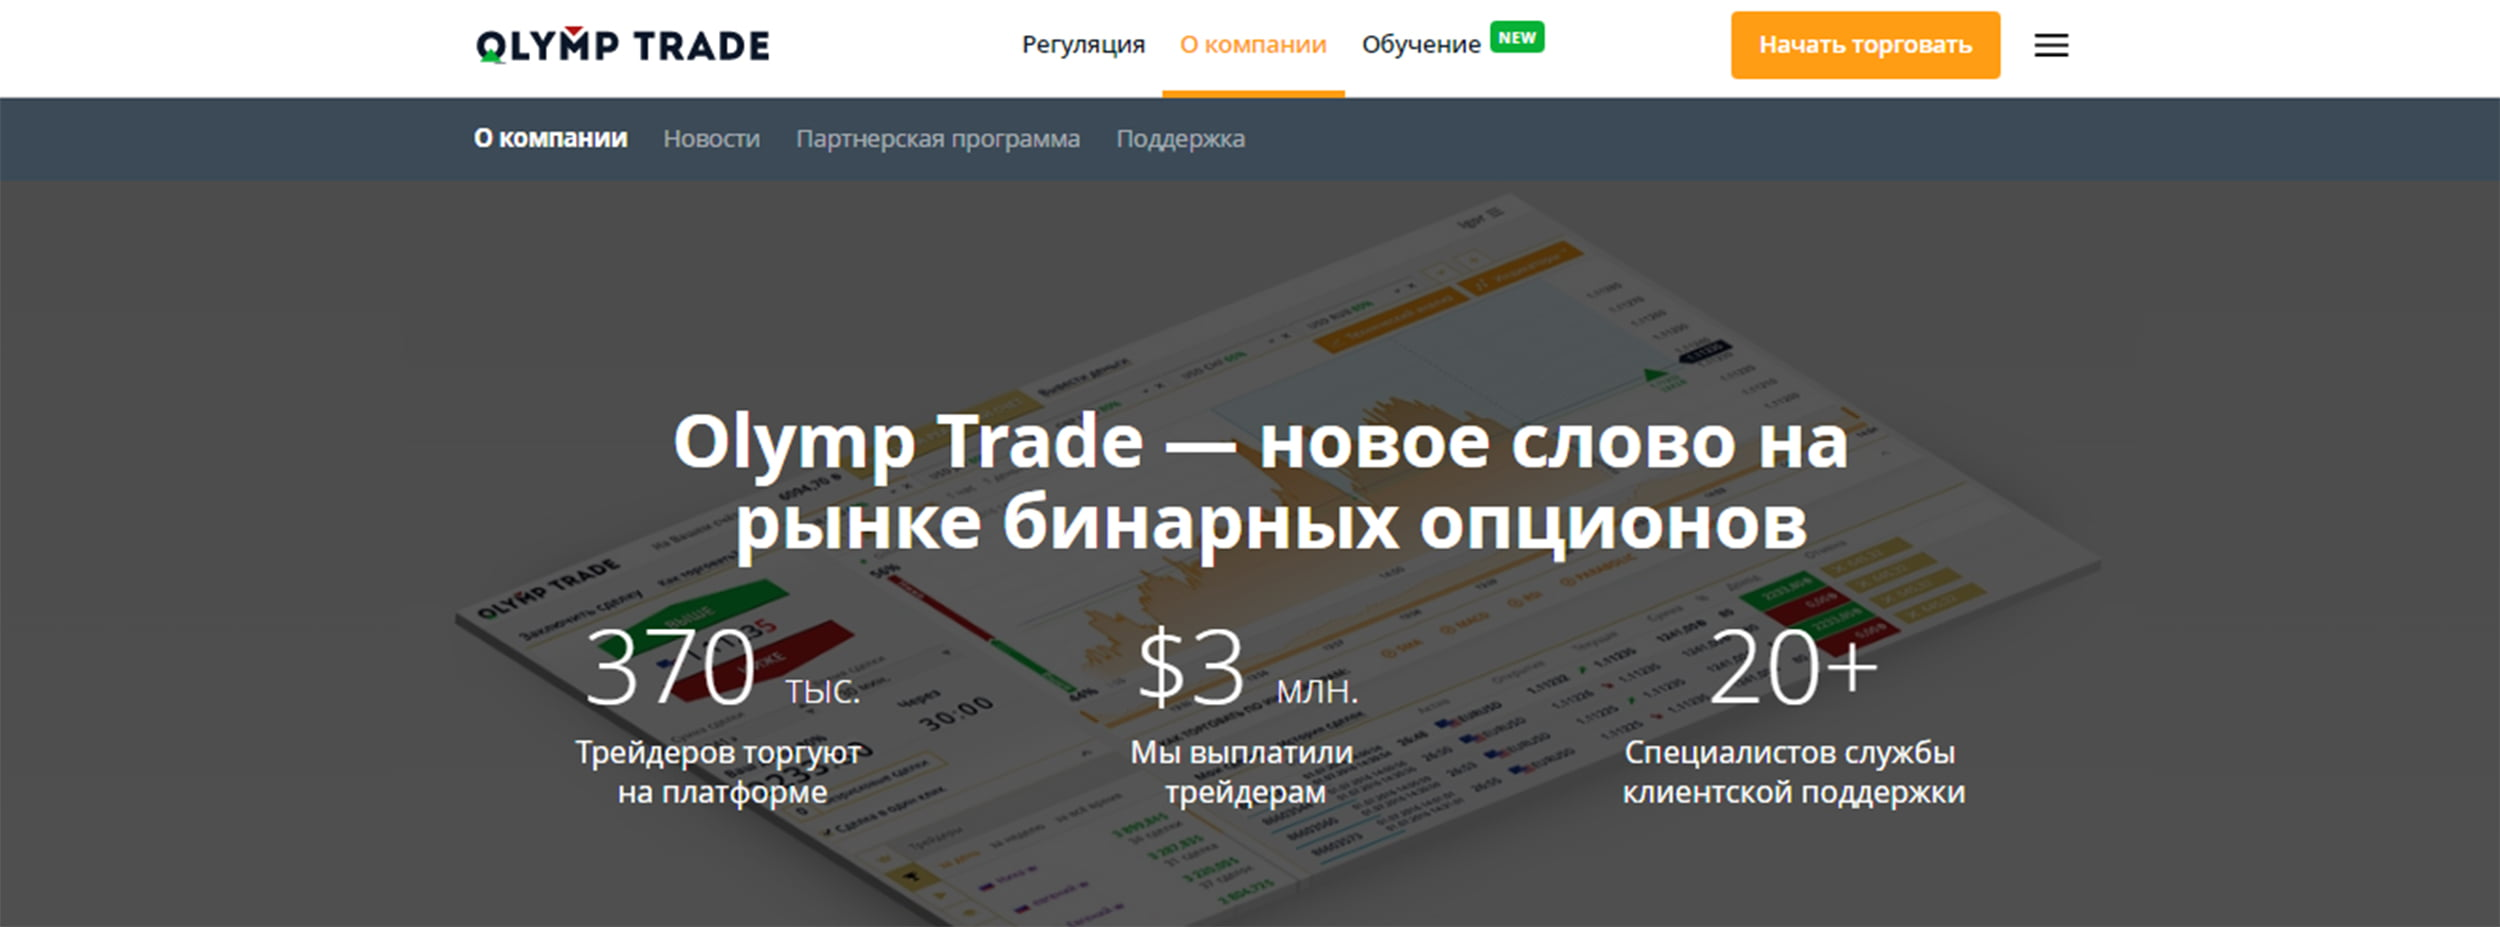 Брокер бинарных опционов Олимп Трейд